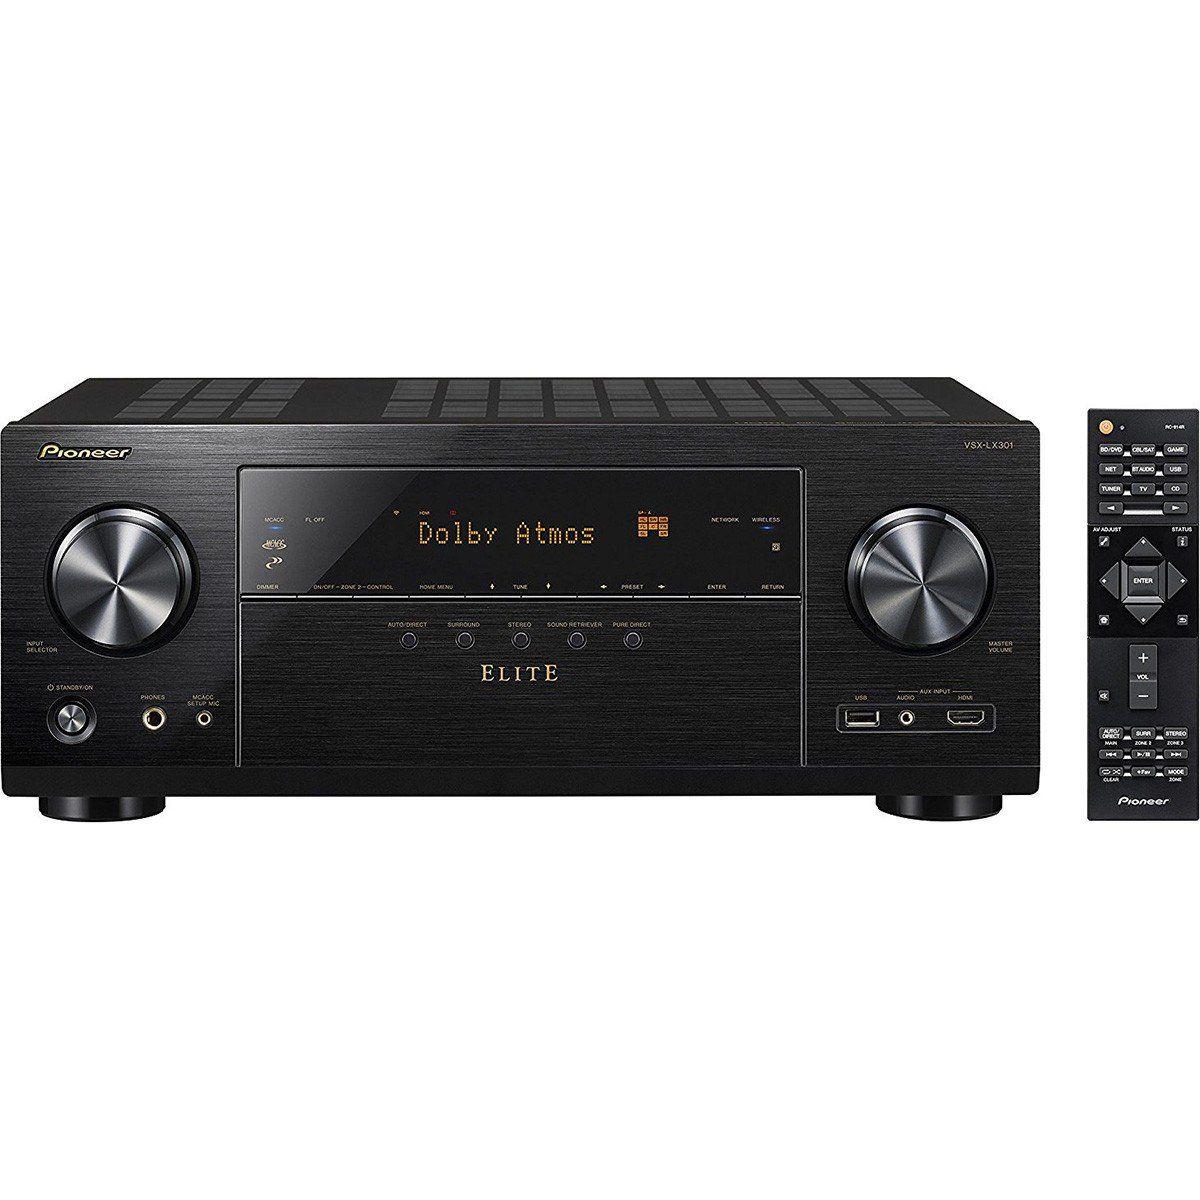 Pioneer VSX-LX301 Elite Receiver para Sistemas Home Theater 7.2 4K Wi-Fi Bluetooth